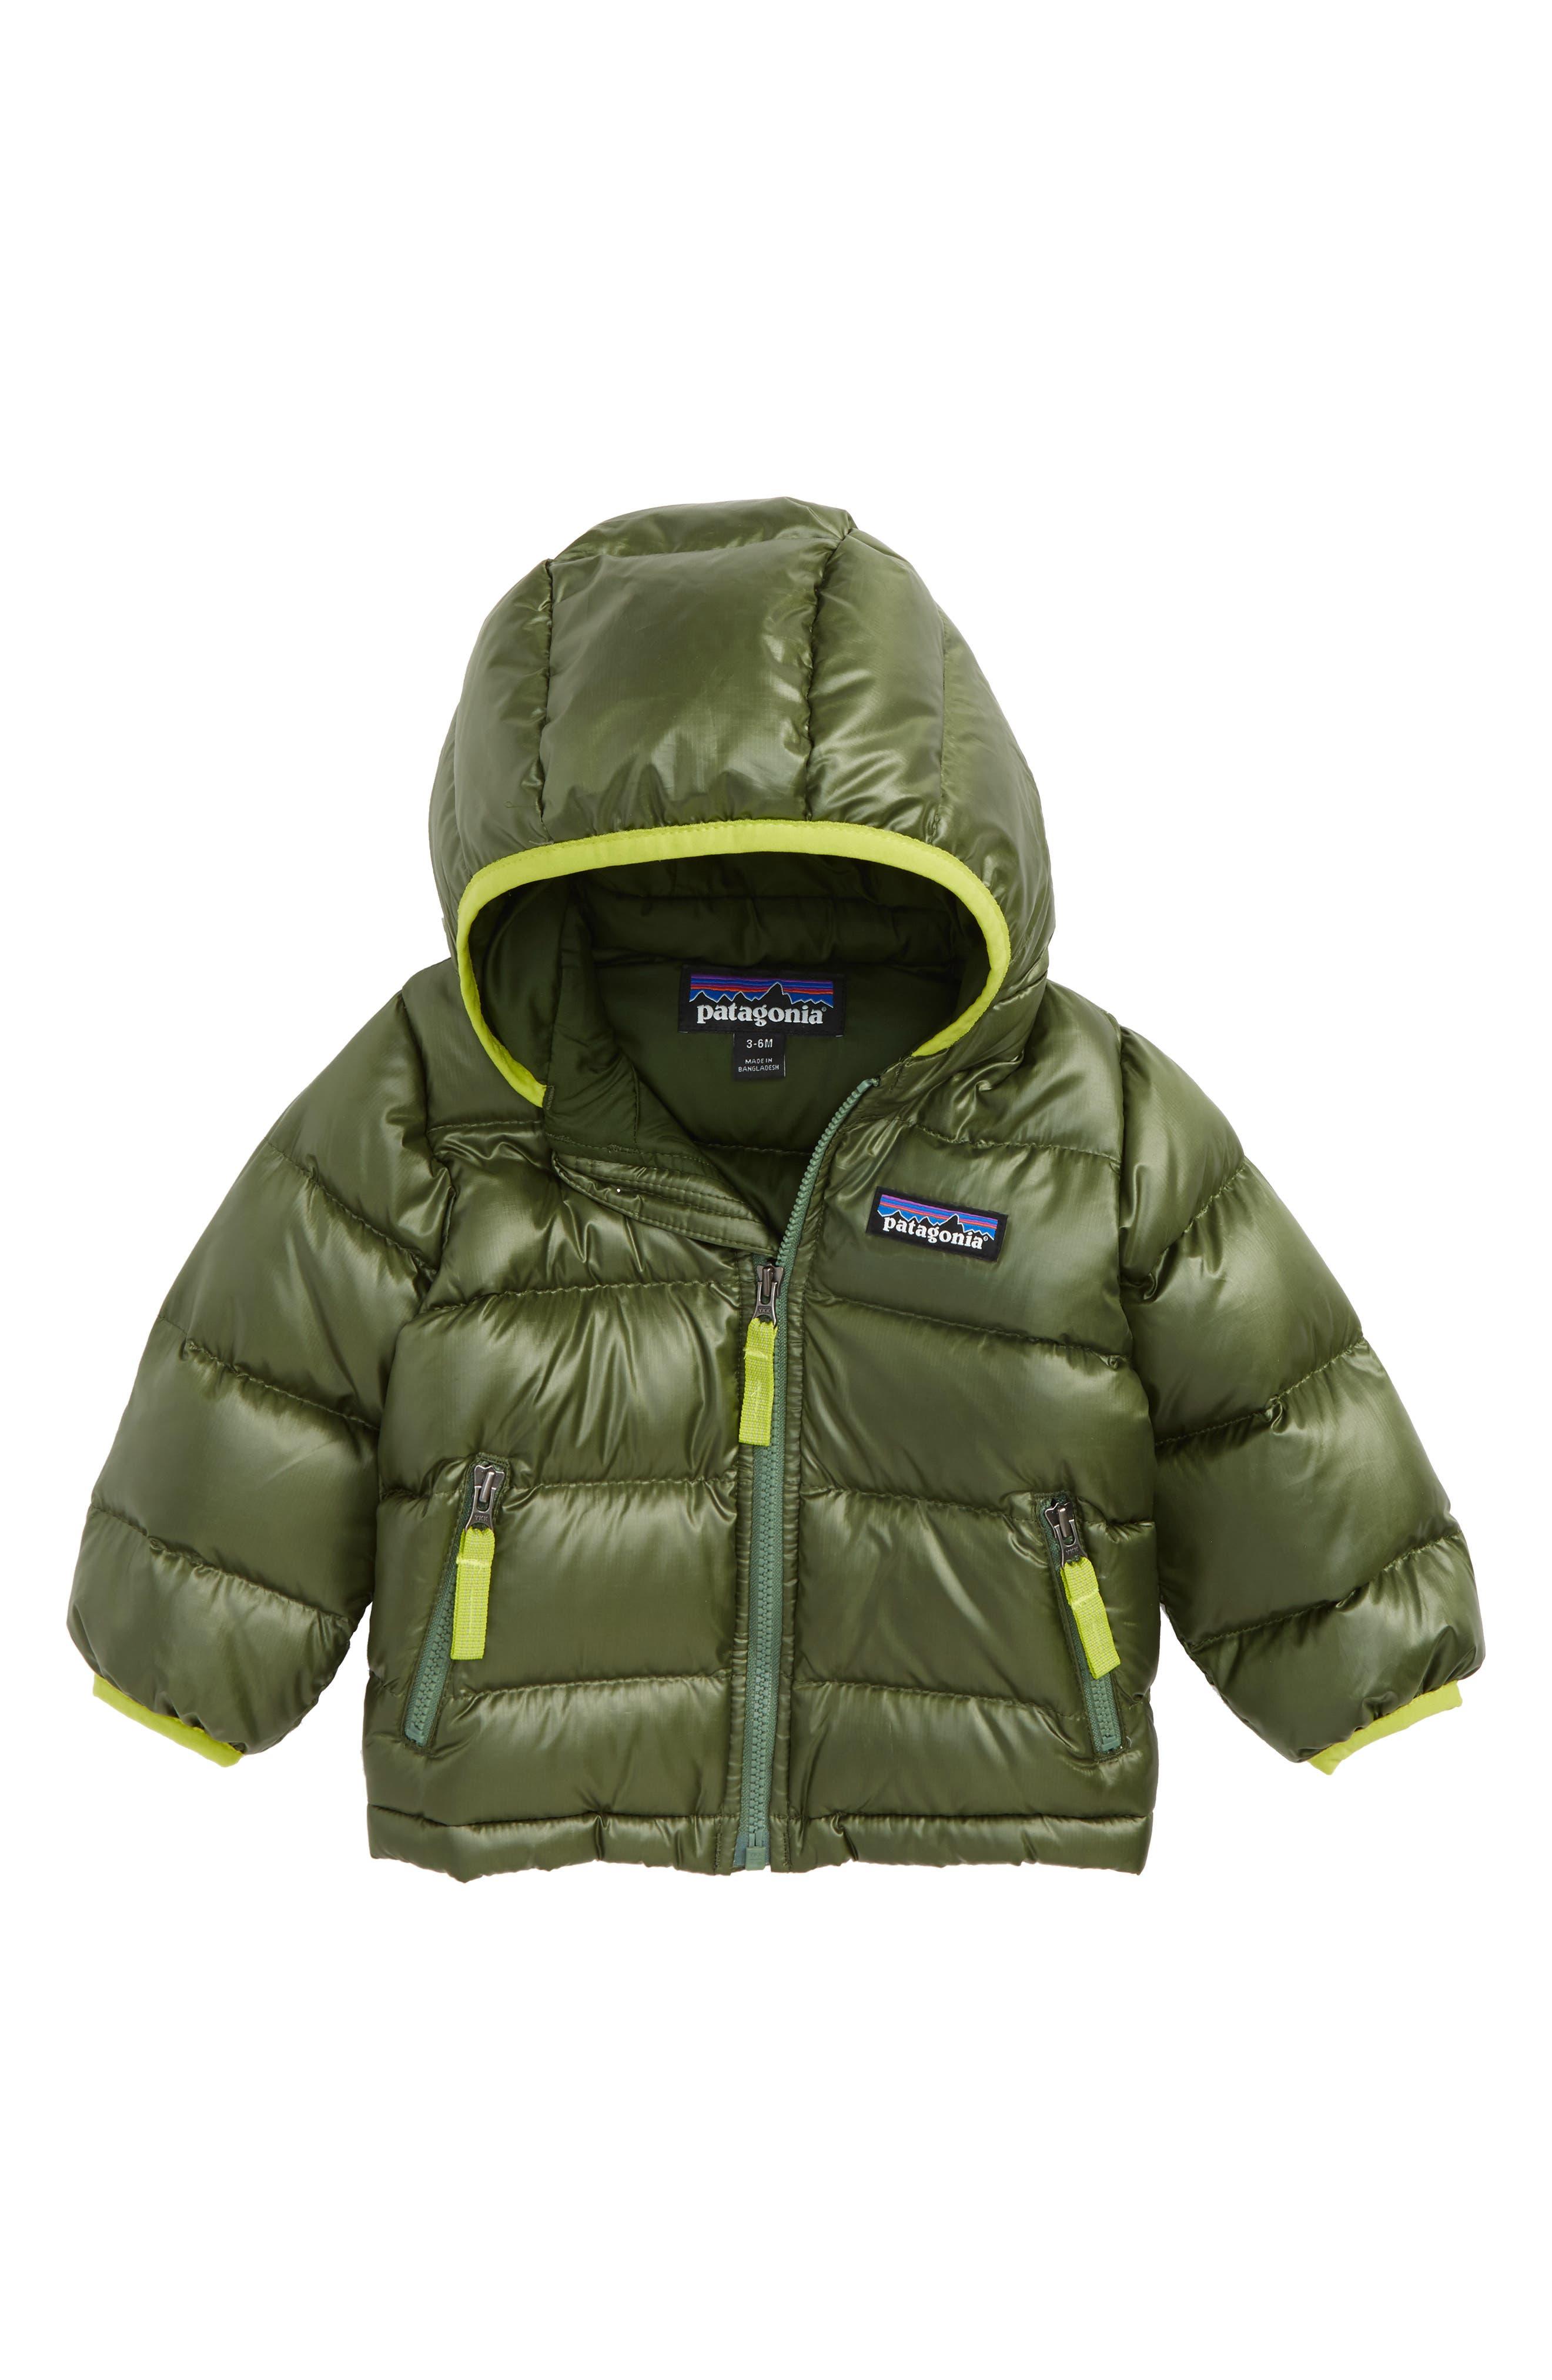 Main Image - Patagonia Hi-Loft Water-Repellent 600-Fill Power Down Sweater Hoodie (Baby Boys)